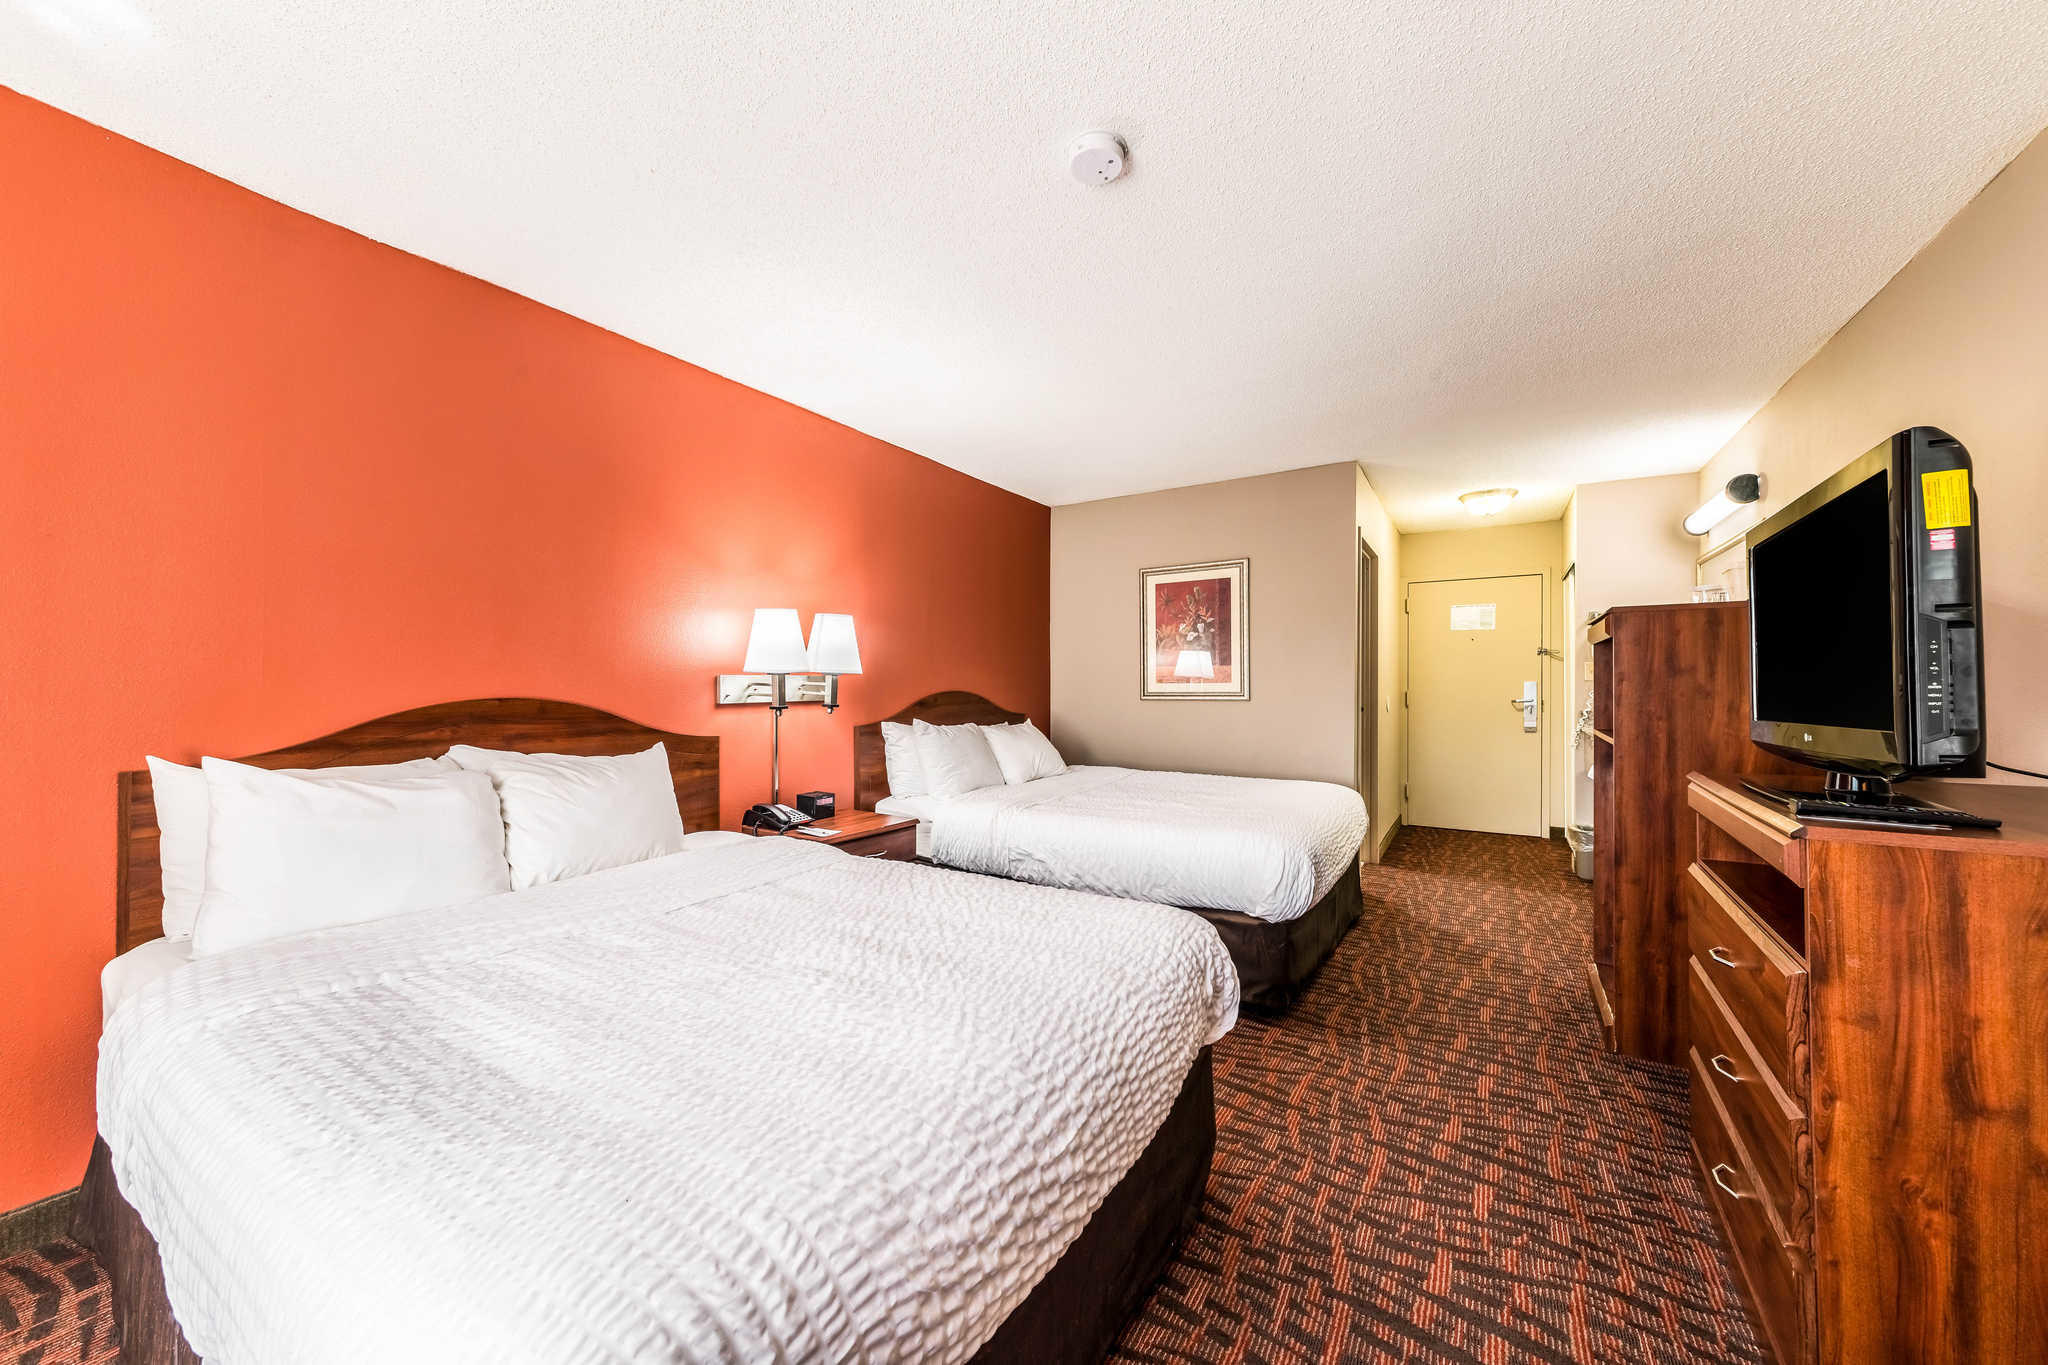 Clarion Inn & Suites image 14